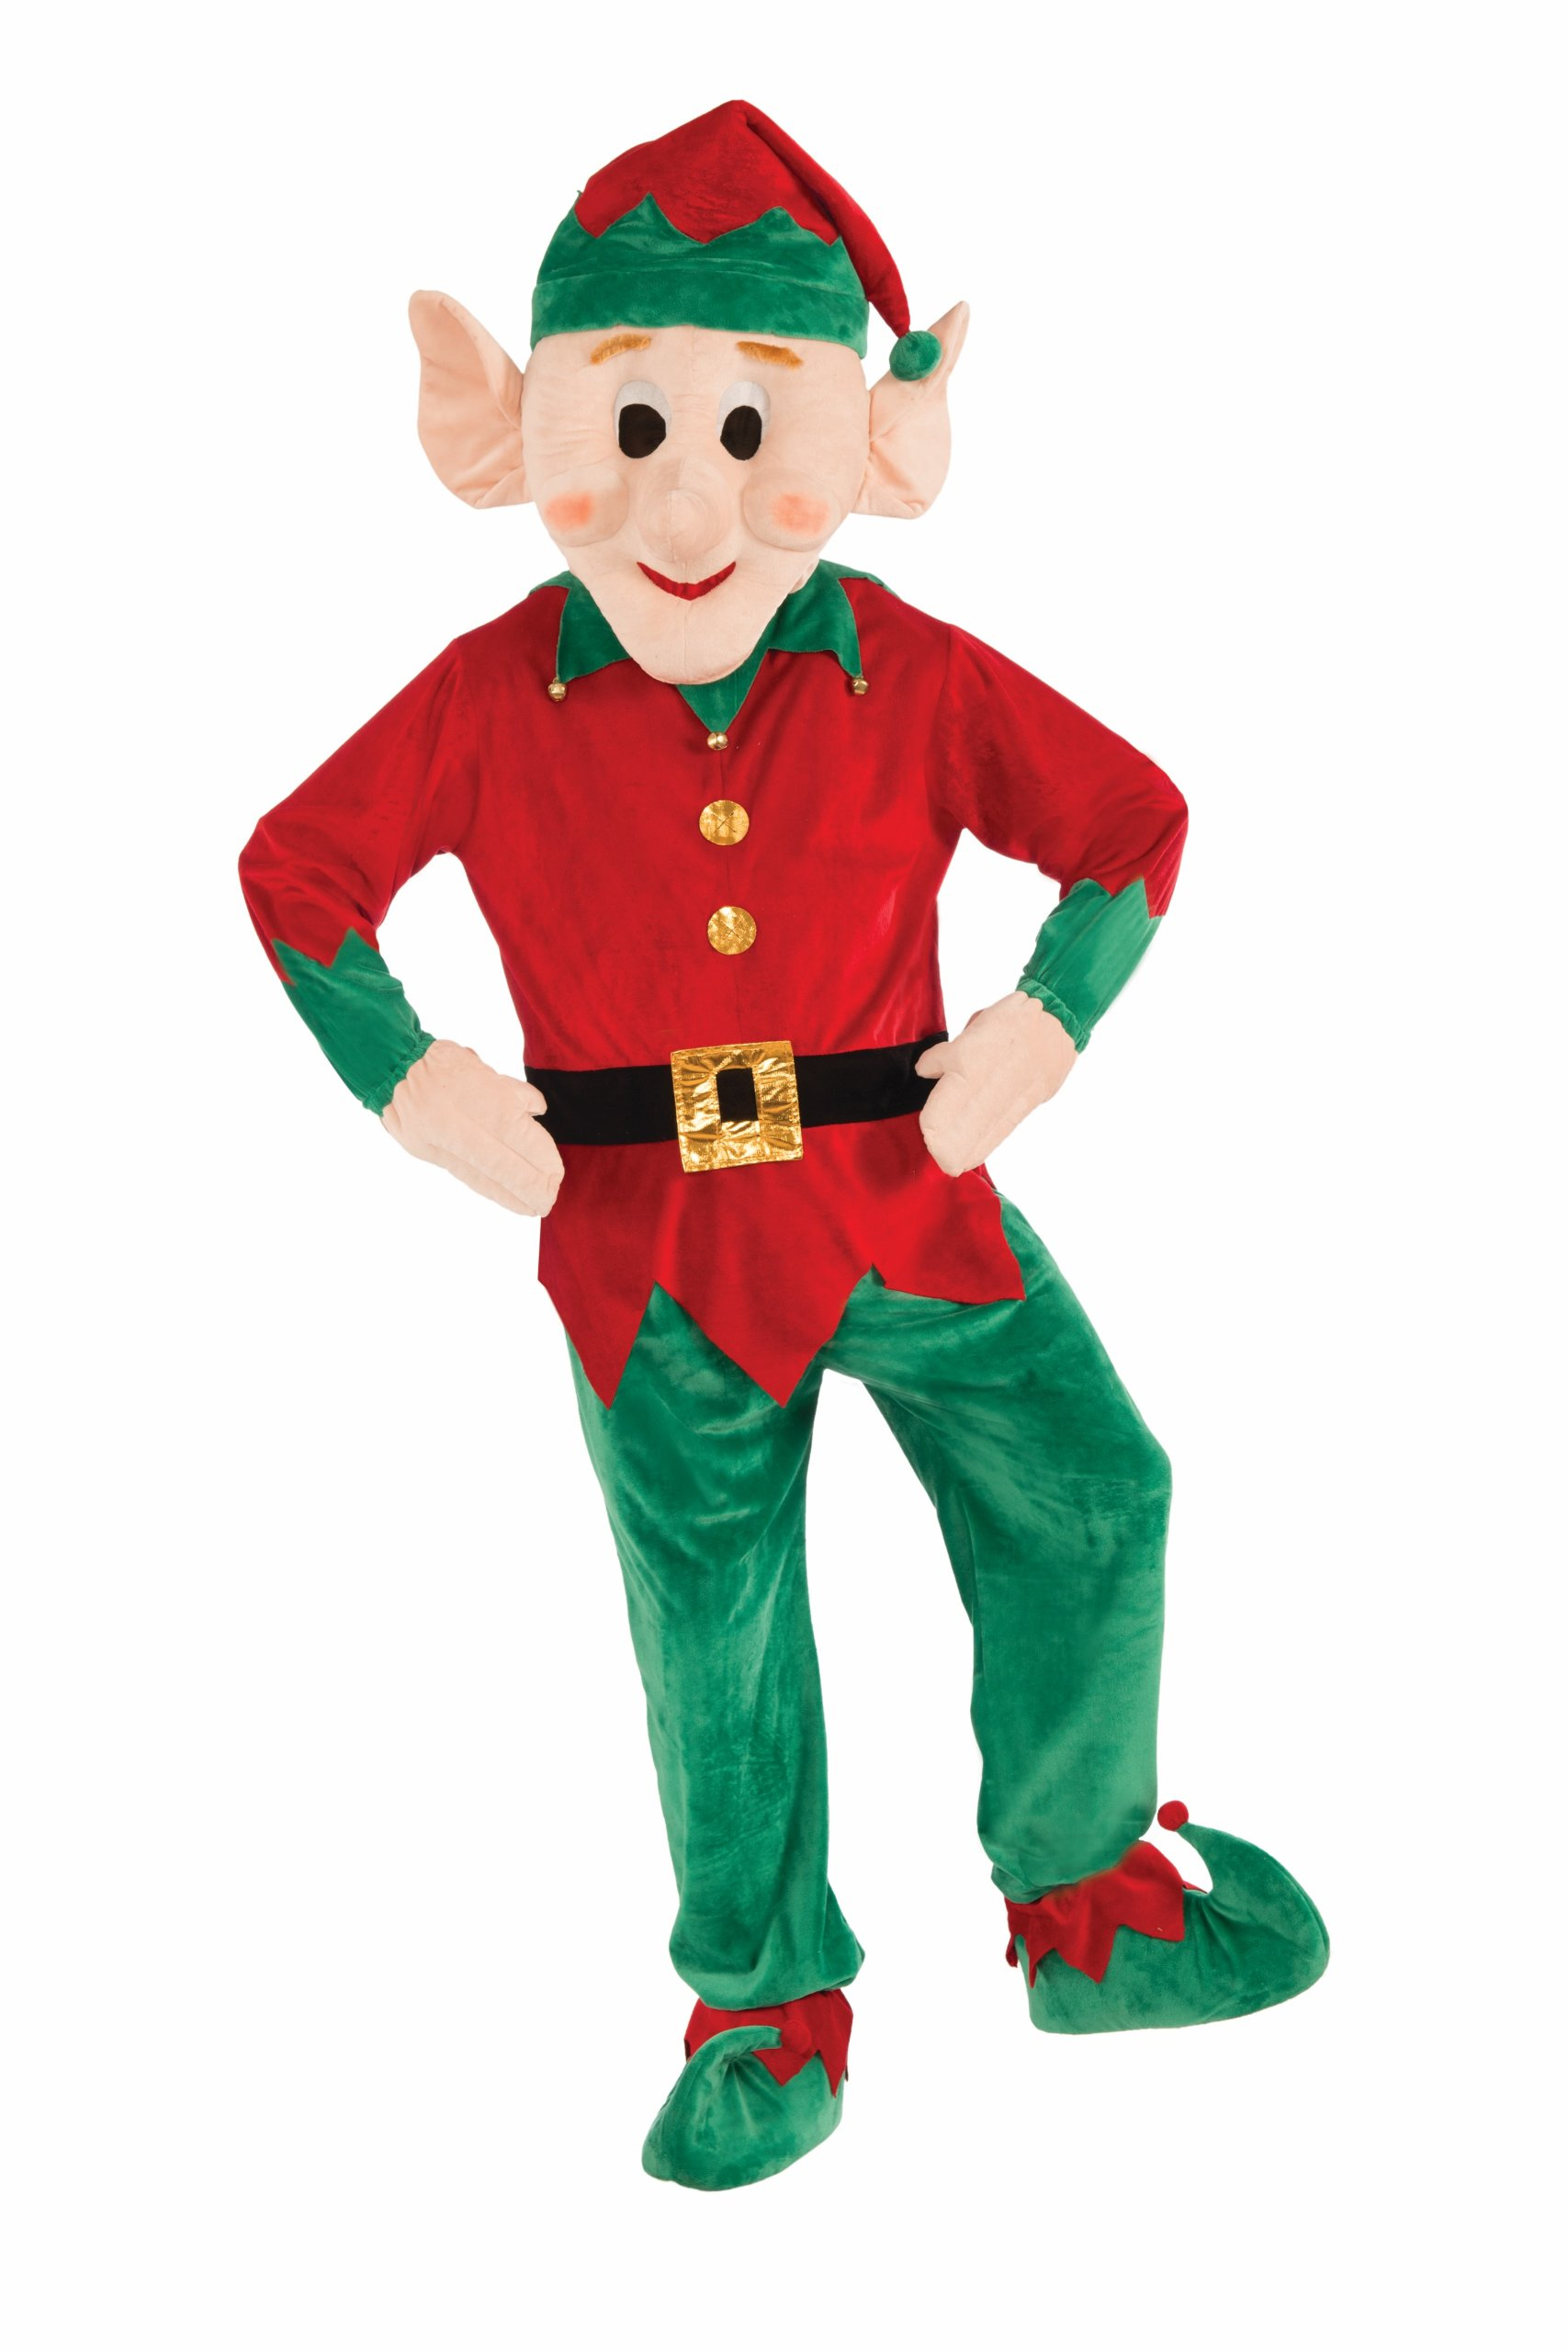 Forum Novelties Men's Plush Elf Mascot Costume, Multi Colored, One Size